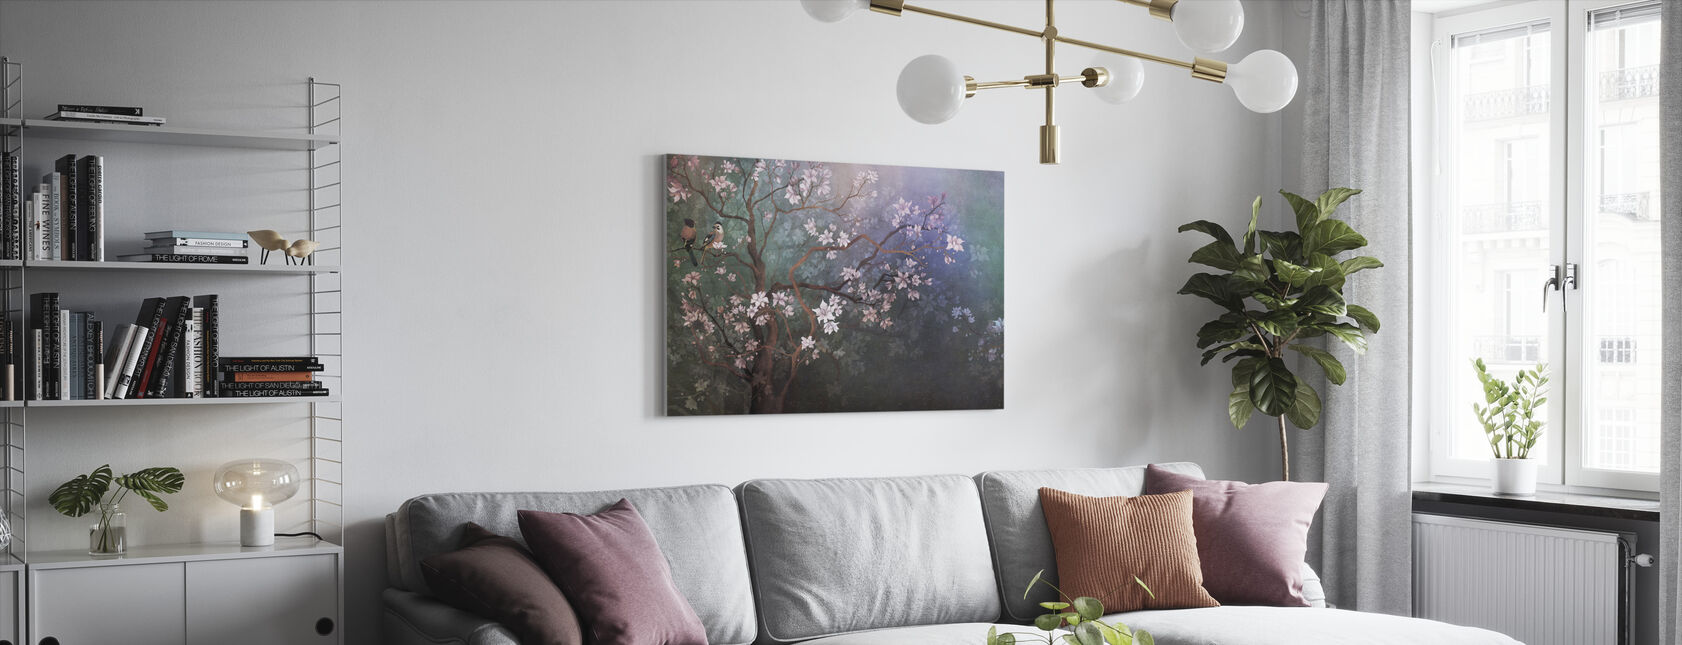 Best Friends Branch V - Canvas print - Living Room